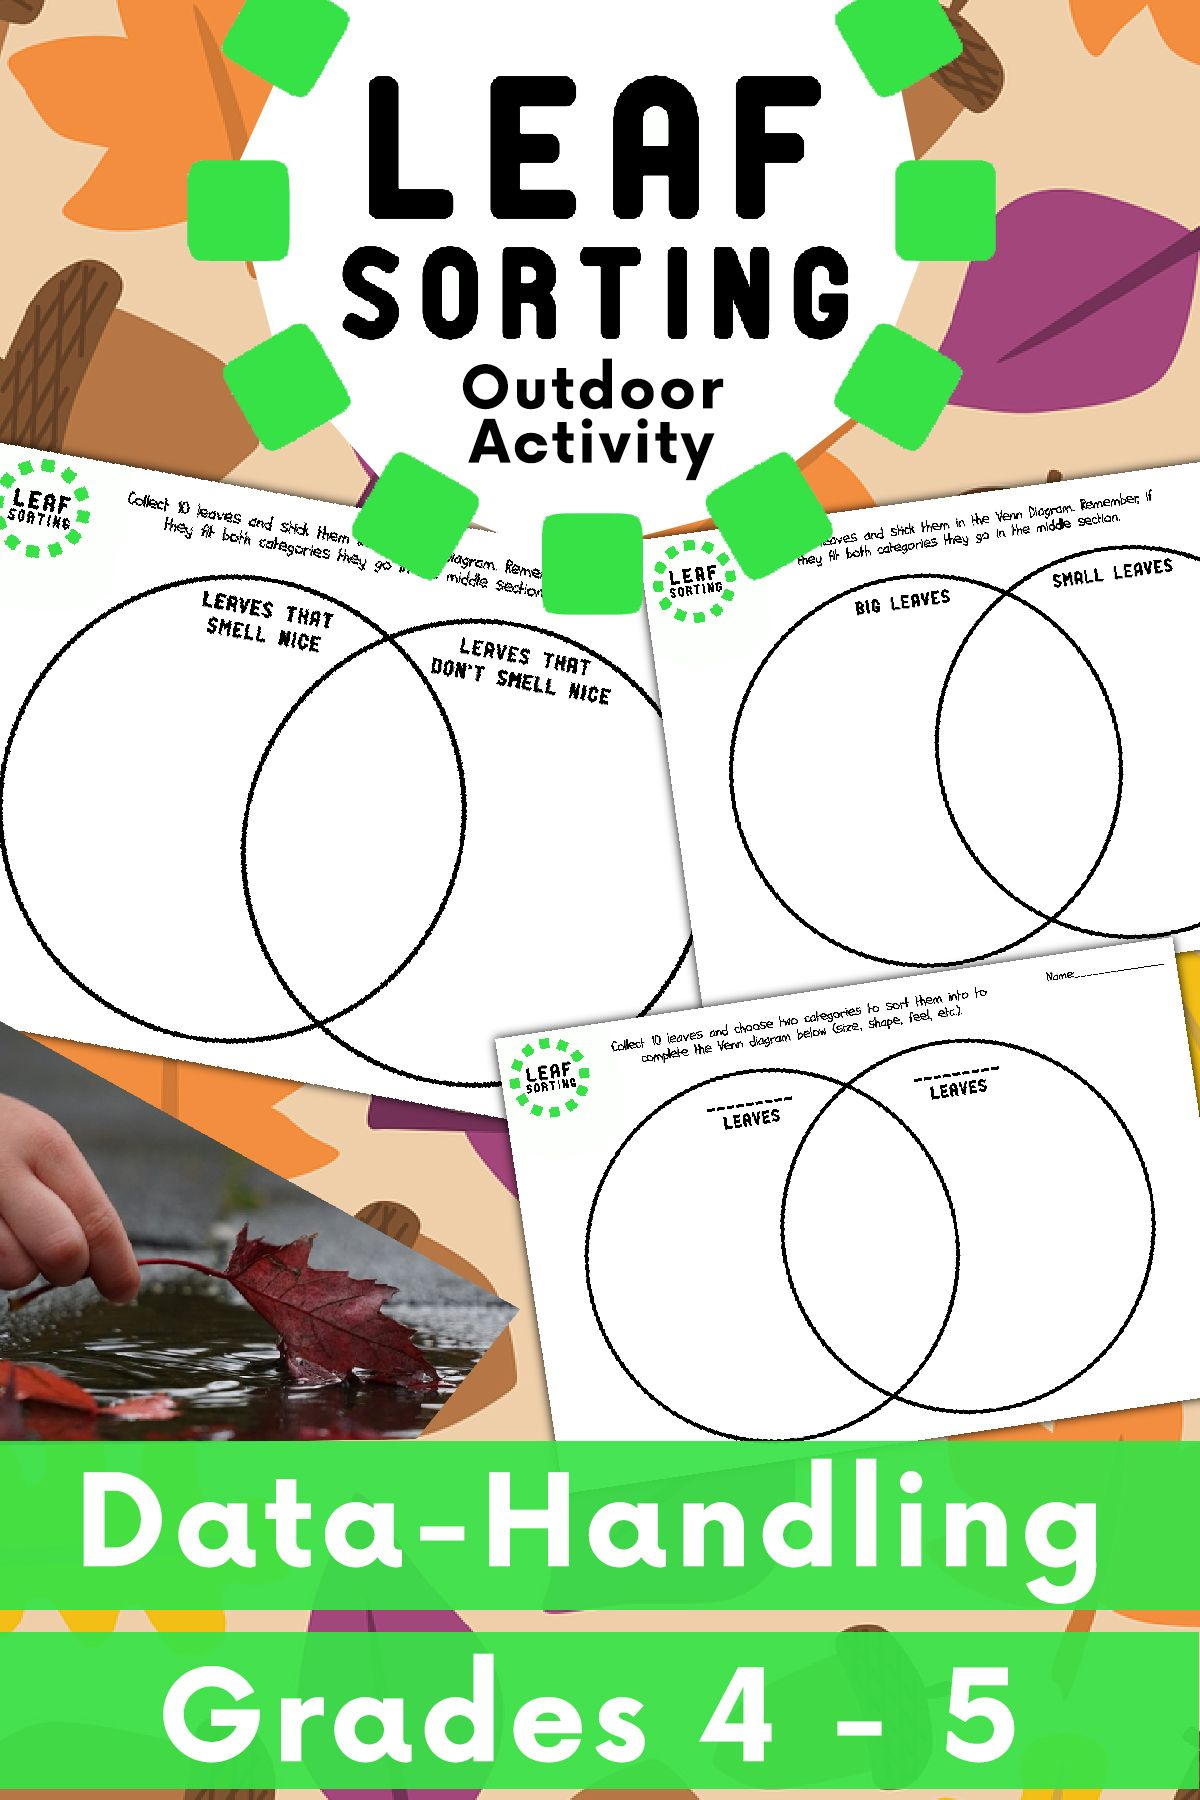 Leaf Sorting Venn Diagram Activity Venn Diagram Activities Venn Diagram How To Introduce Yourself [ 1800 x 1200 Pixel ]